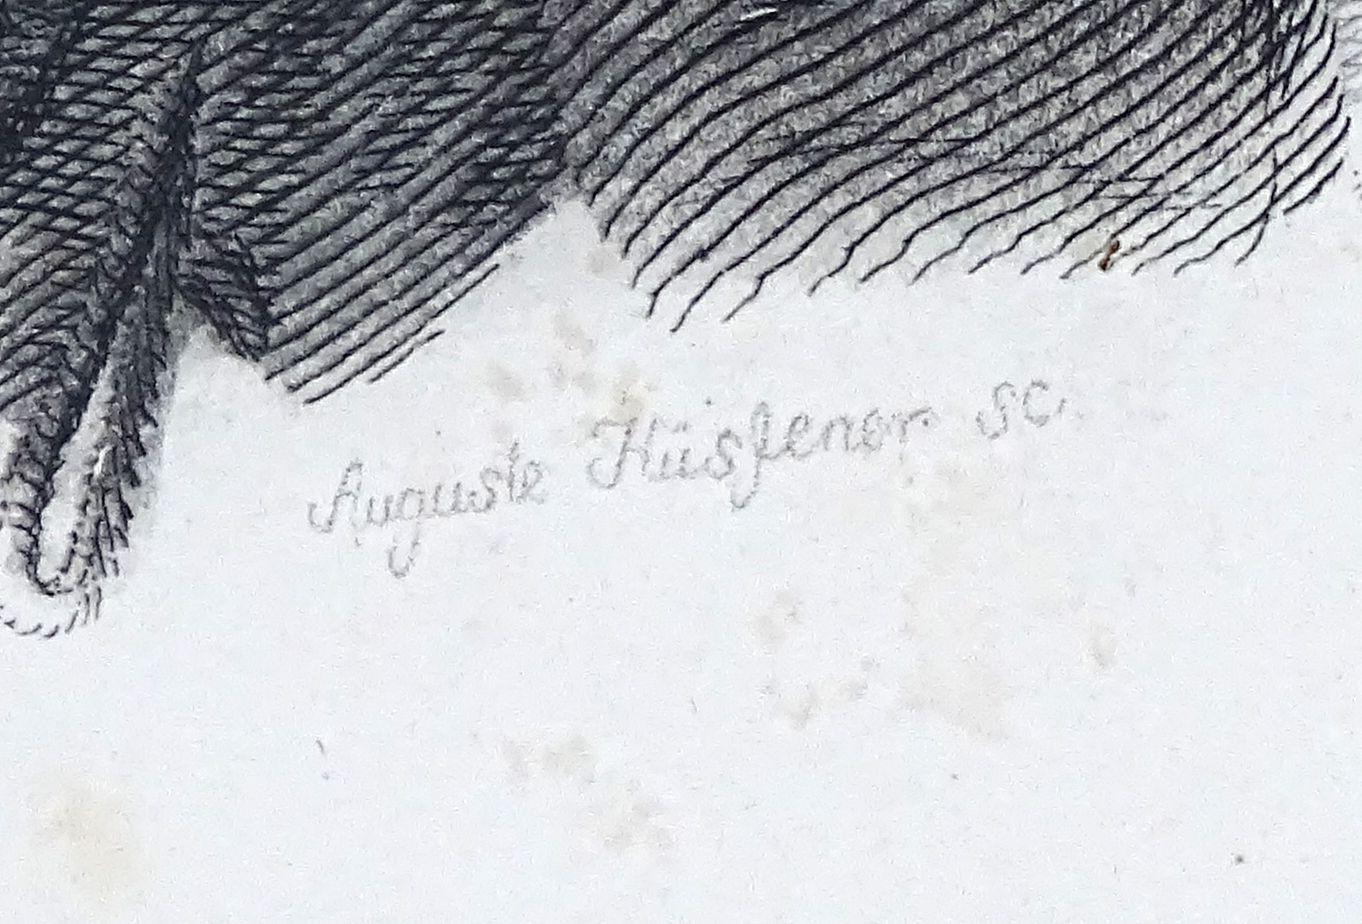 DSC03351.JPG (1362×924)